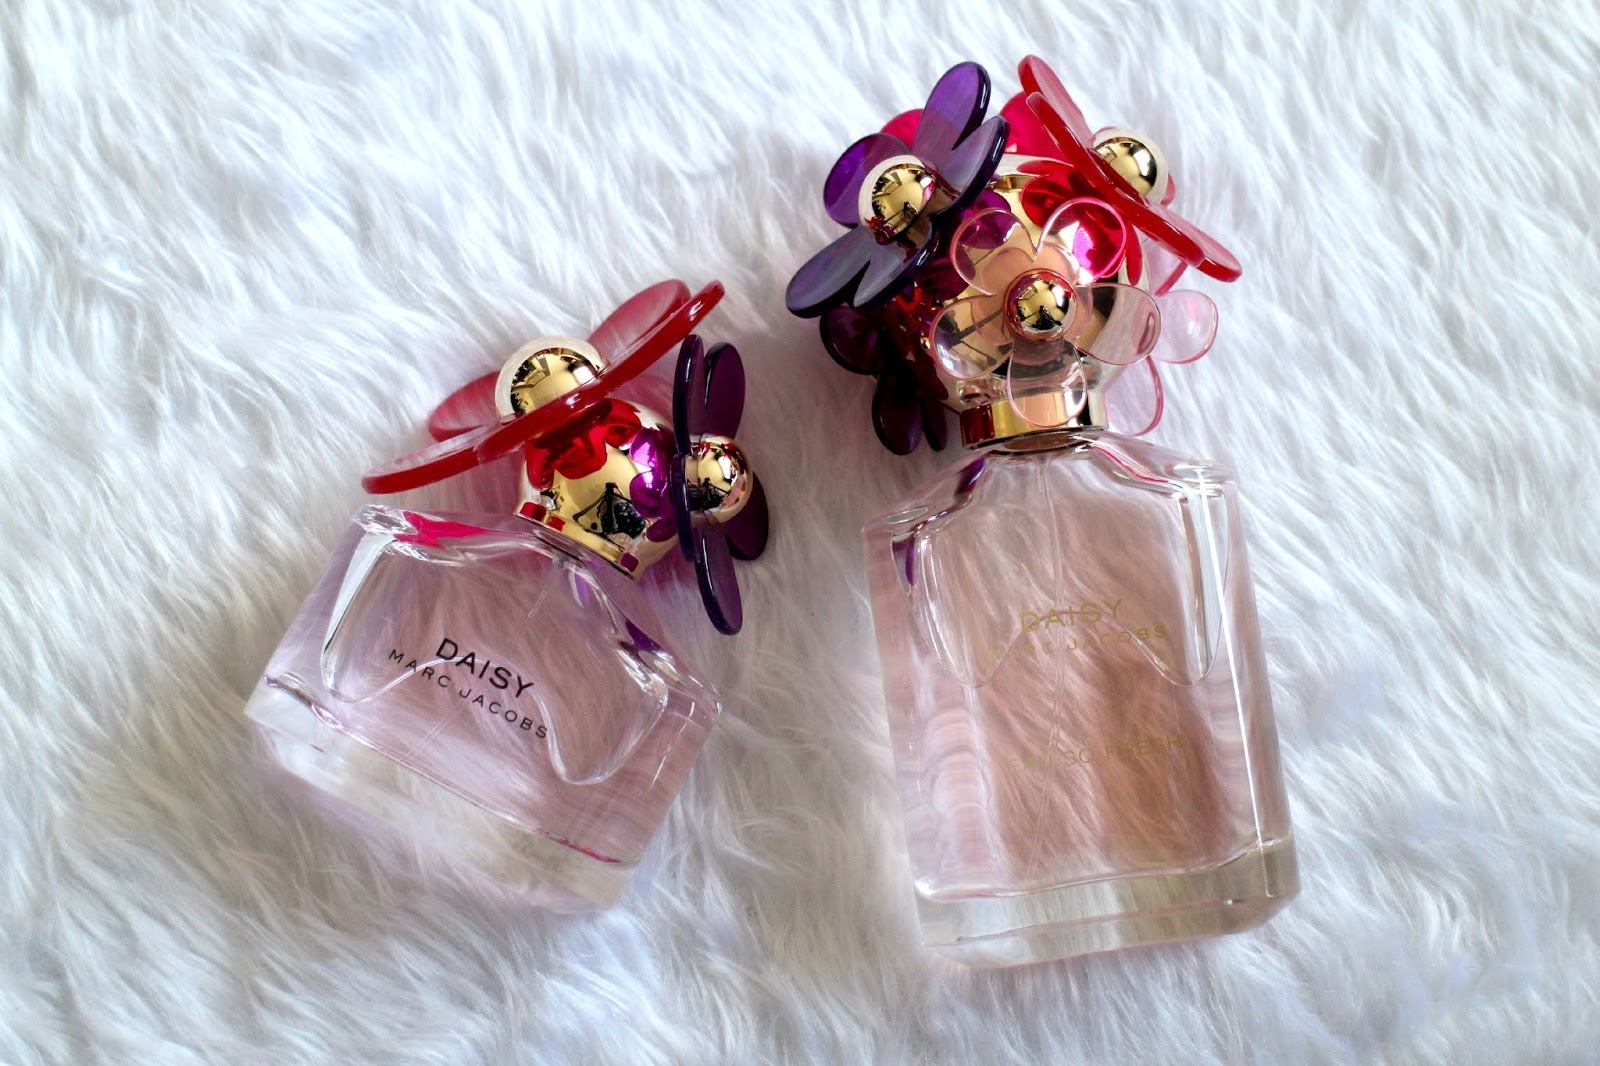 Marc Jacobs Daisy Sorbet Perfume